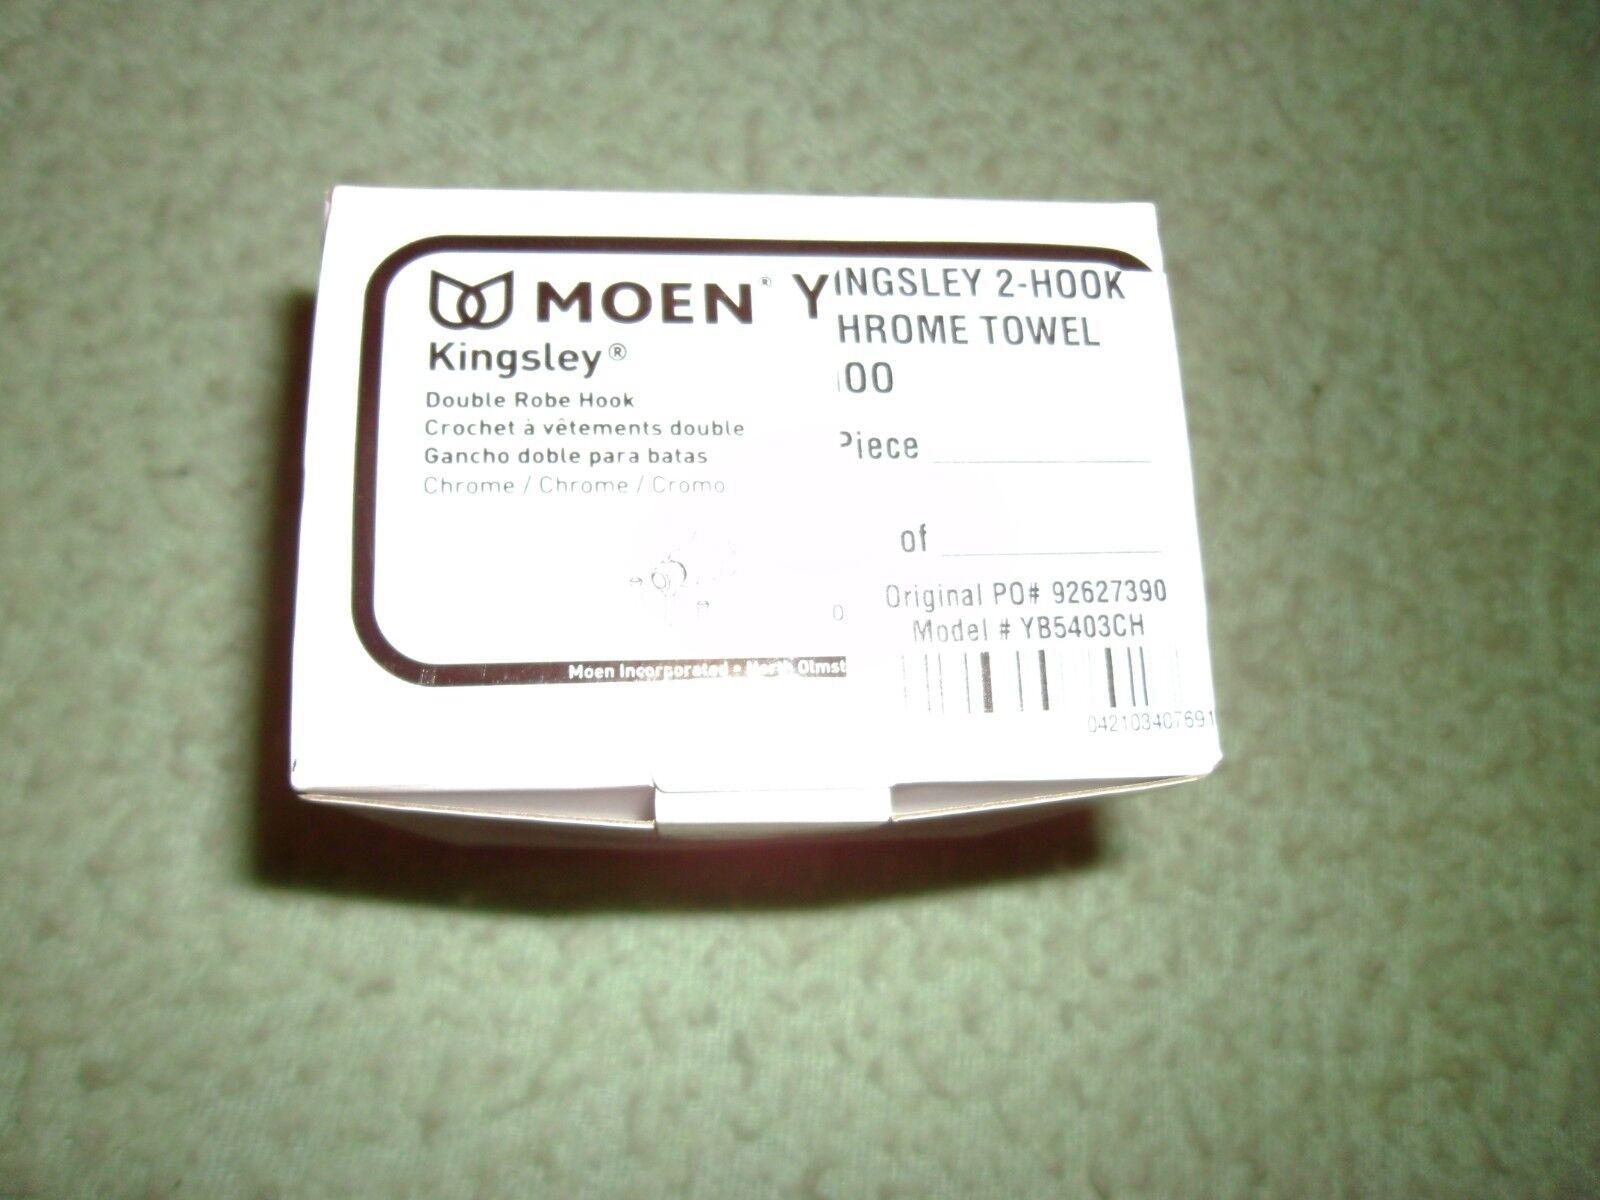 MOEN Kingsley Double Robe Hook in Chrome YB5403CH - New